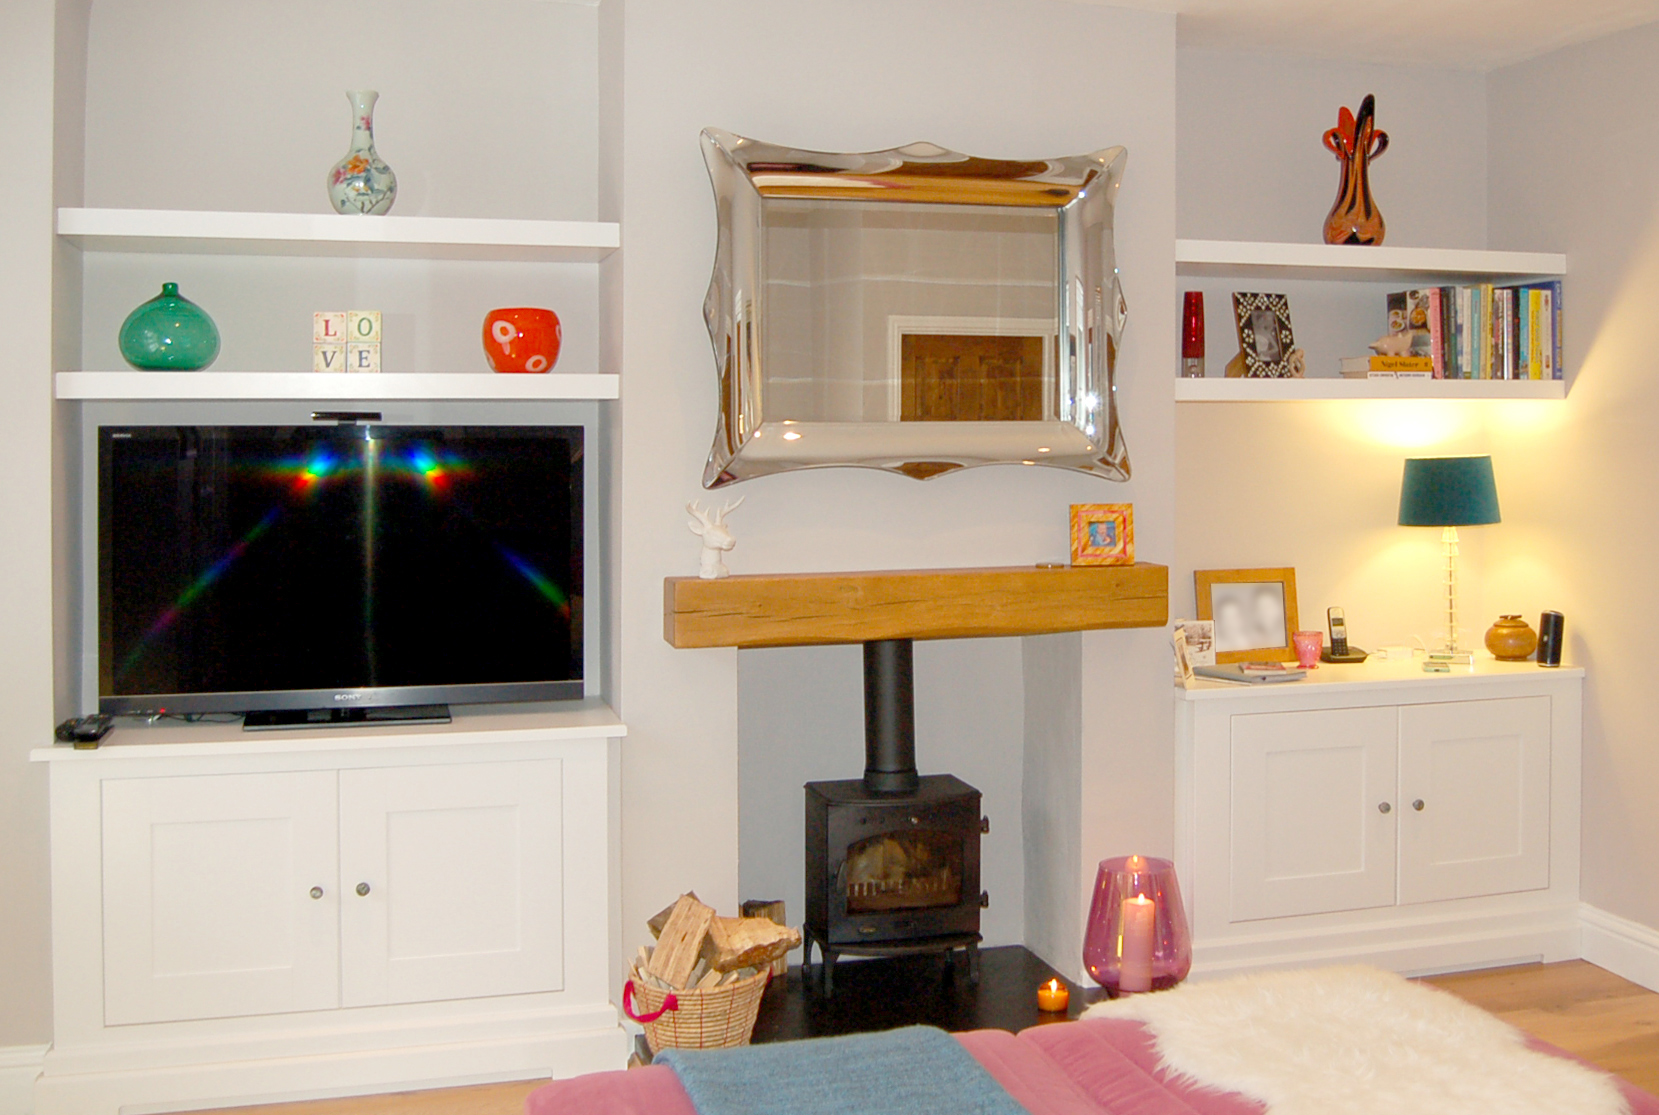 Base Cabinets And Floating Shelves